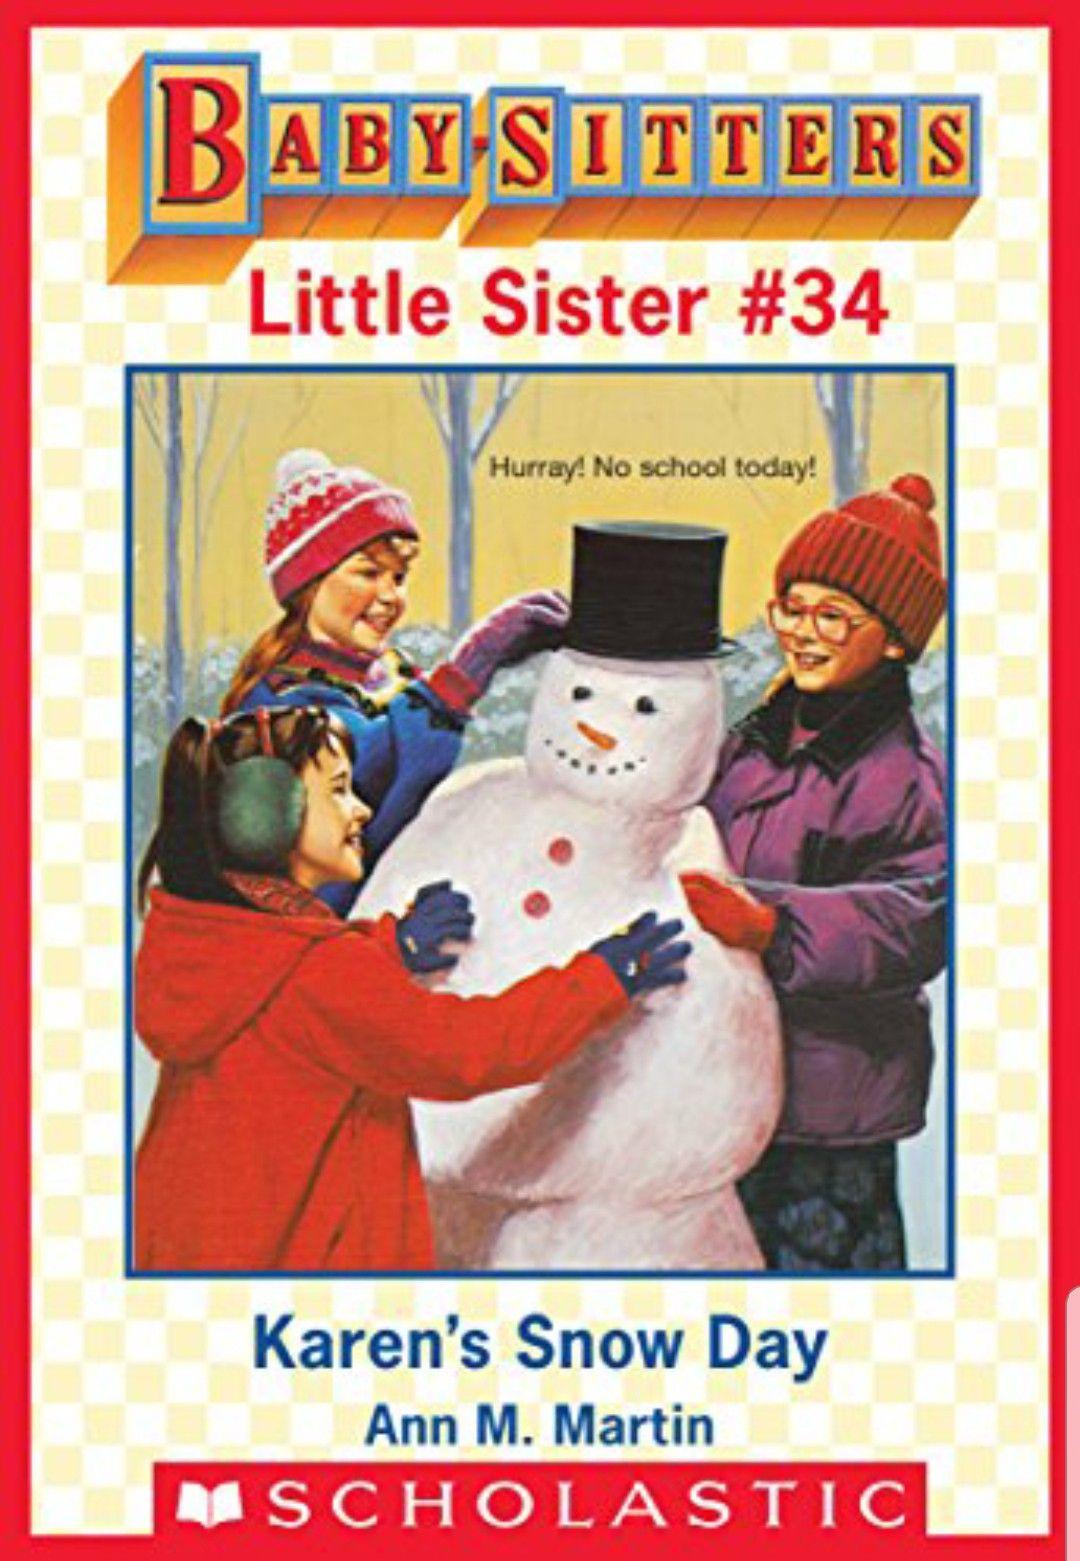 Hannie nancy karen little sisters sitter snow day